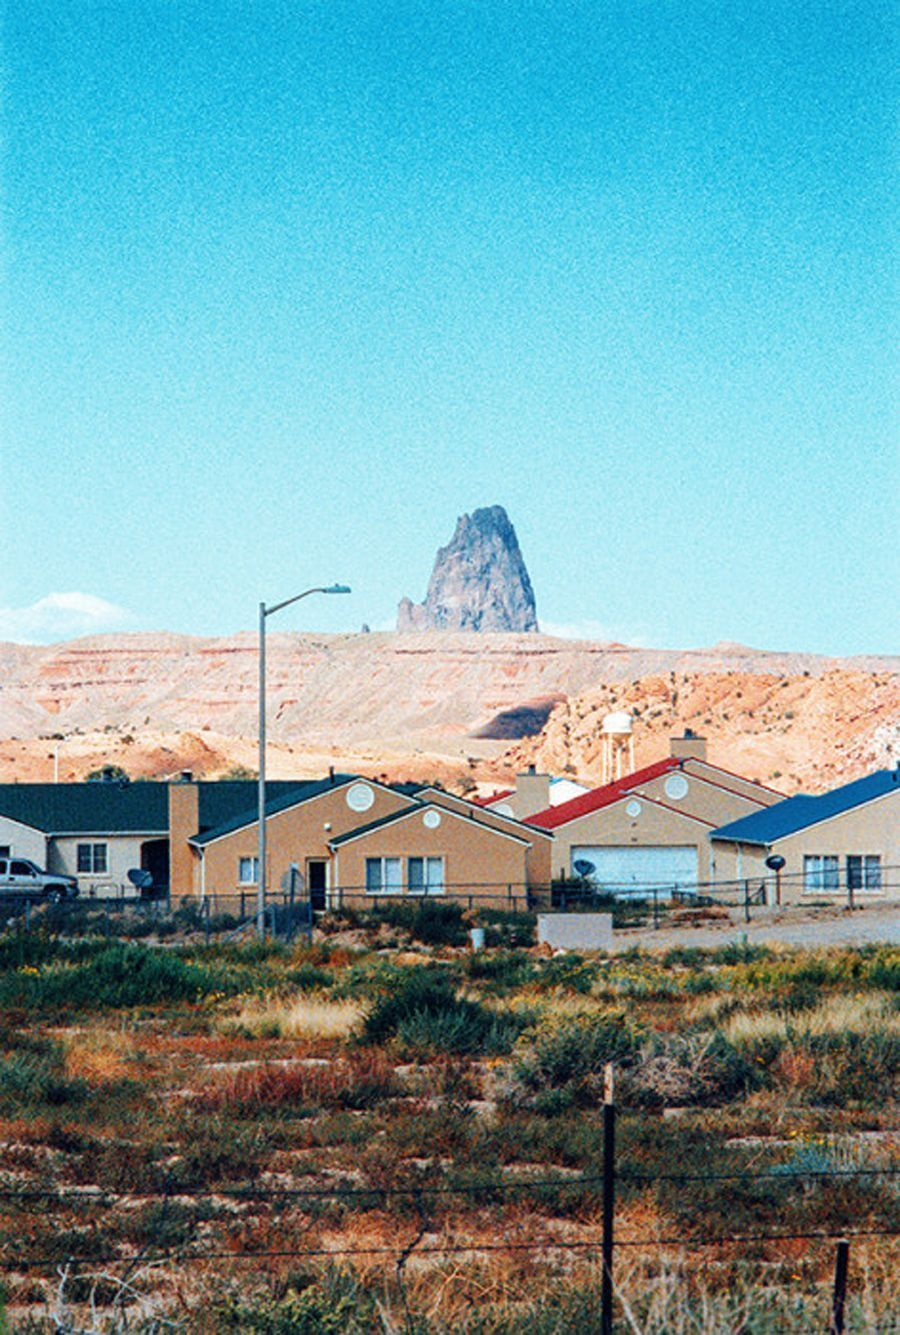 landscapephotos